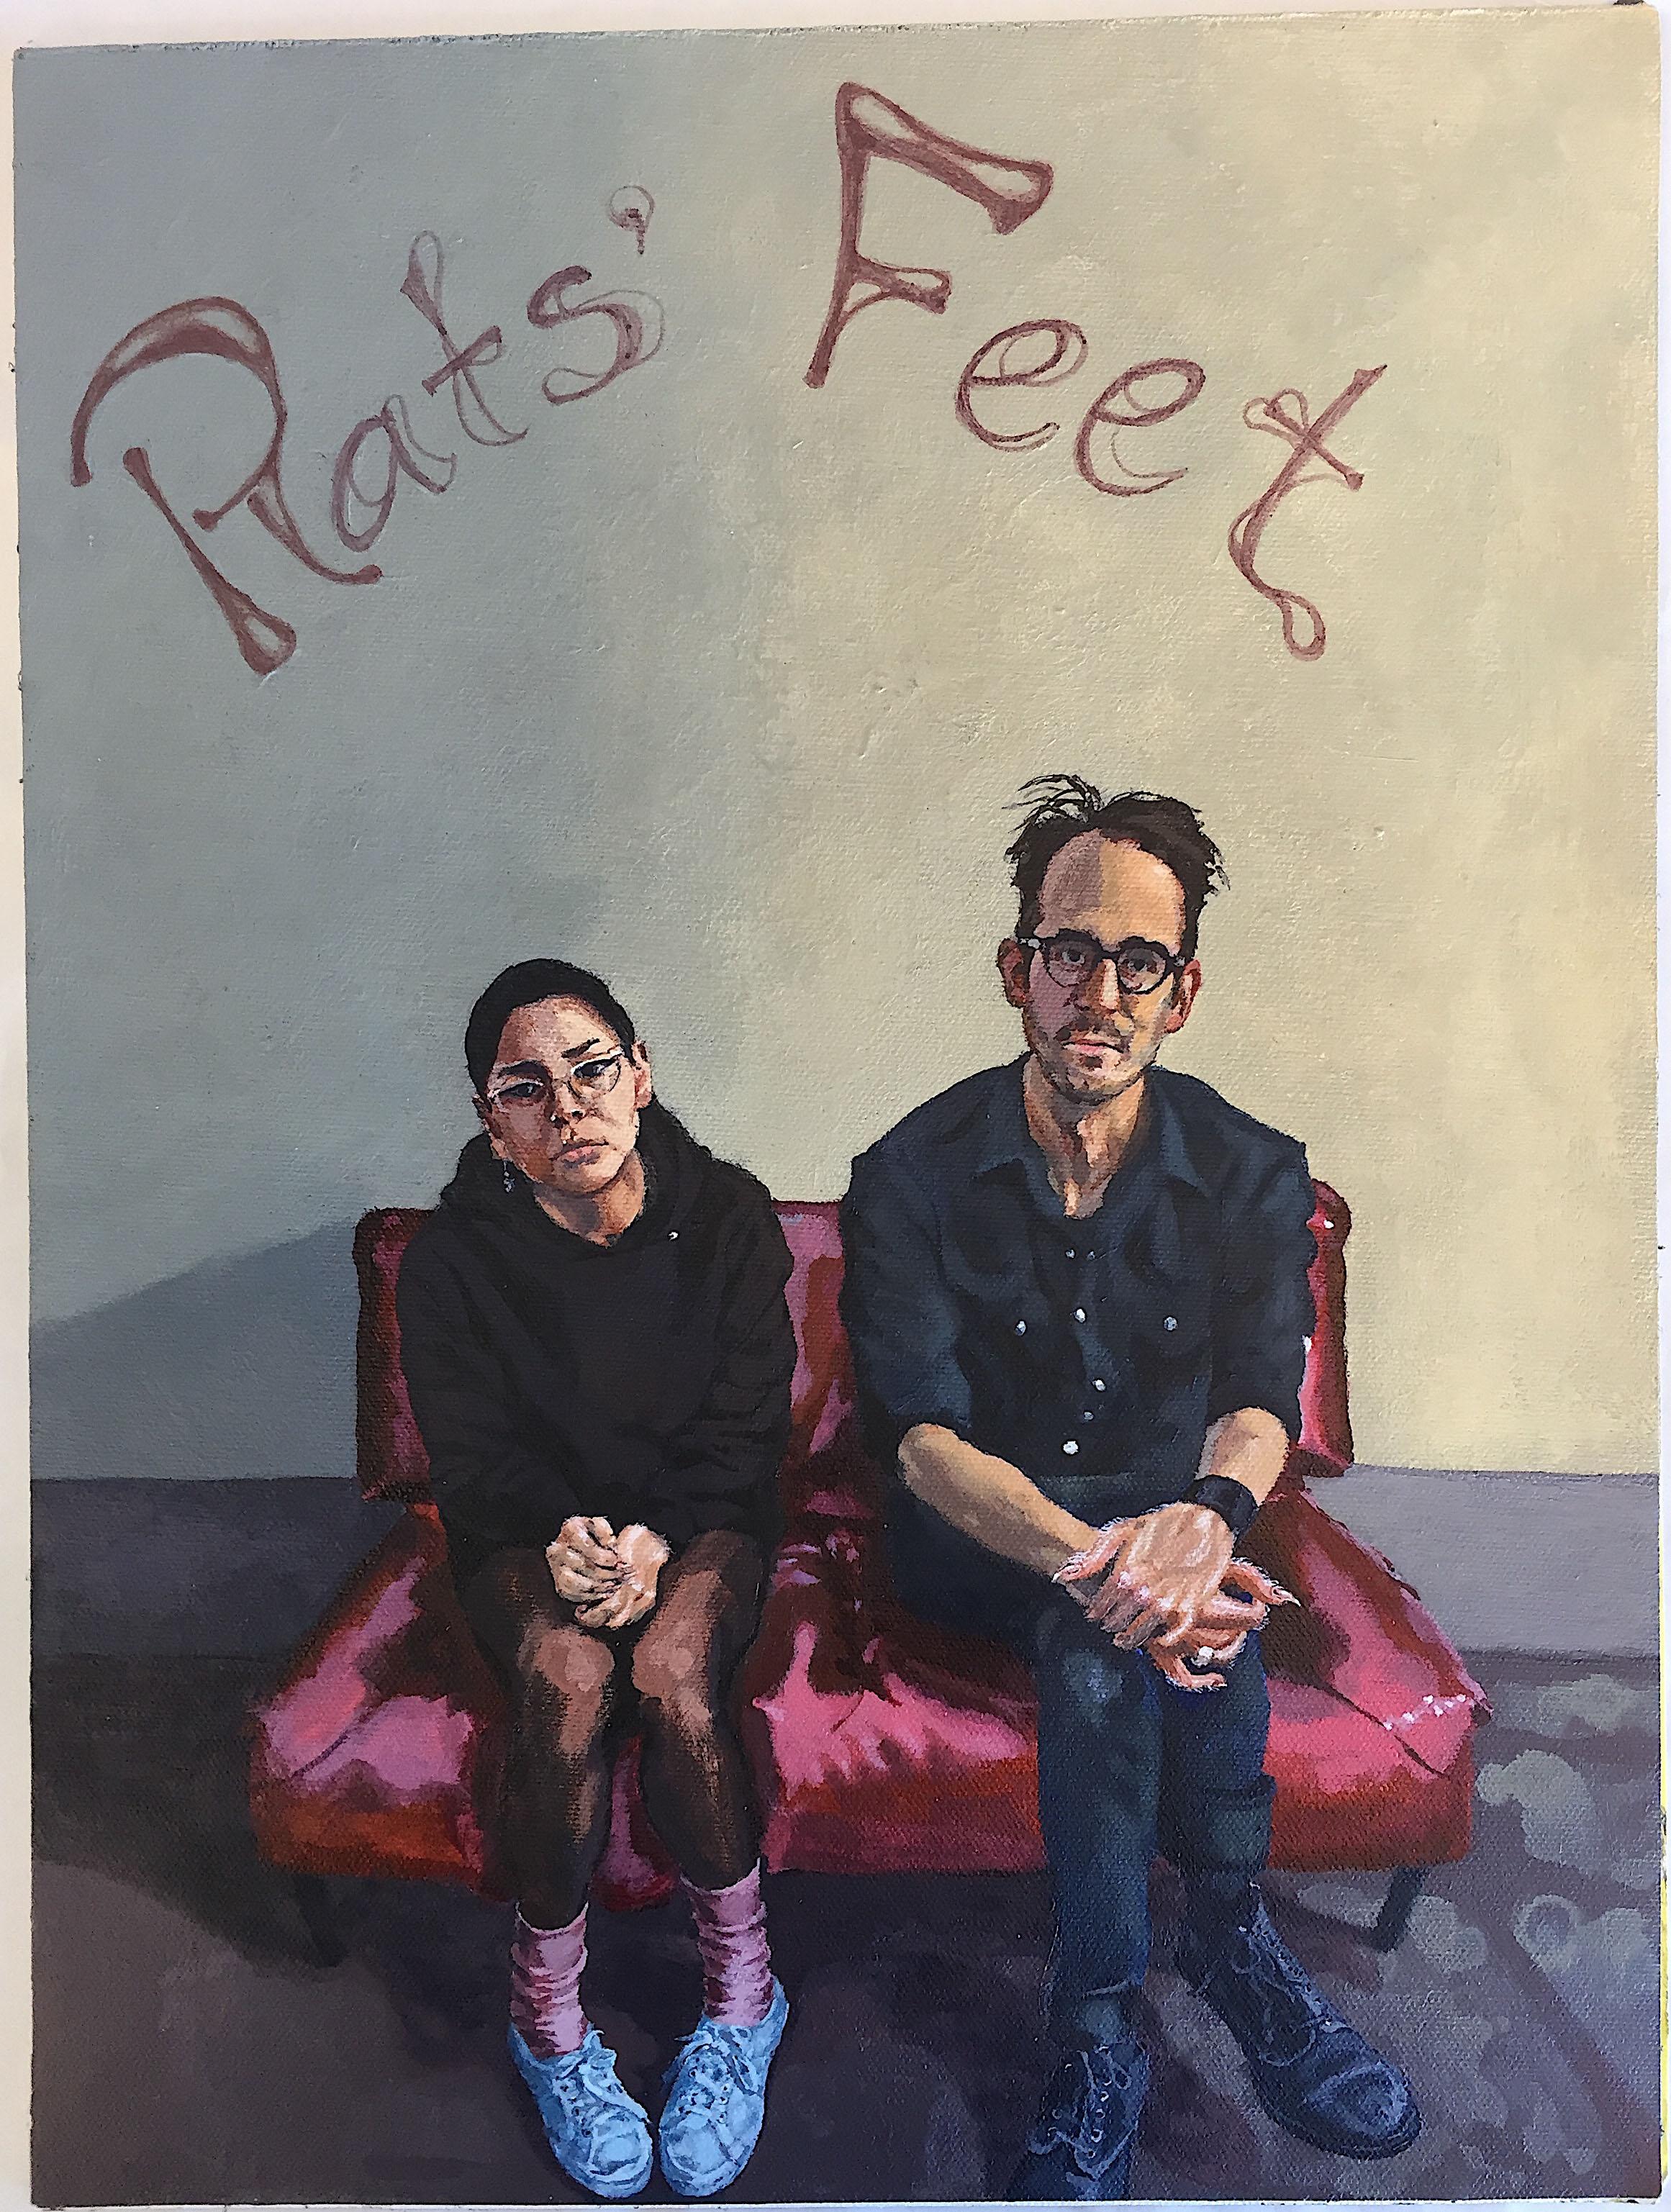 Rats' Feet (Mother)